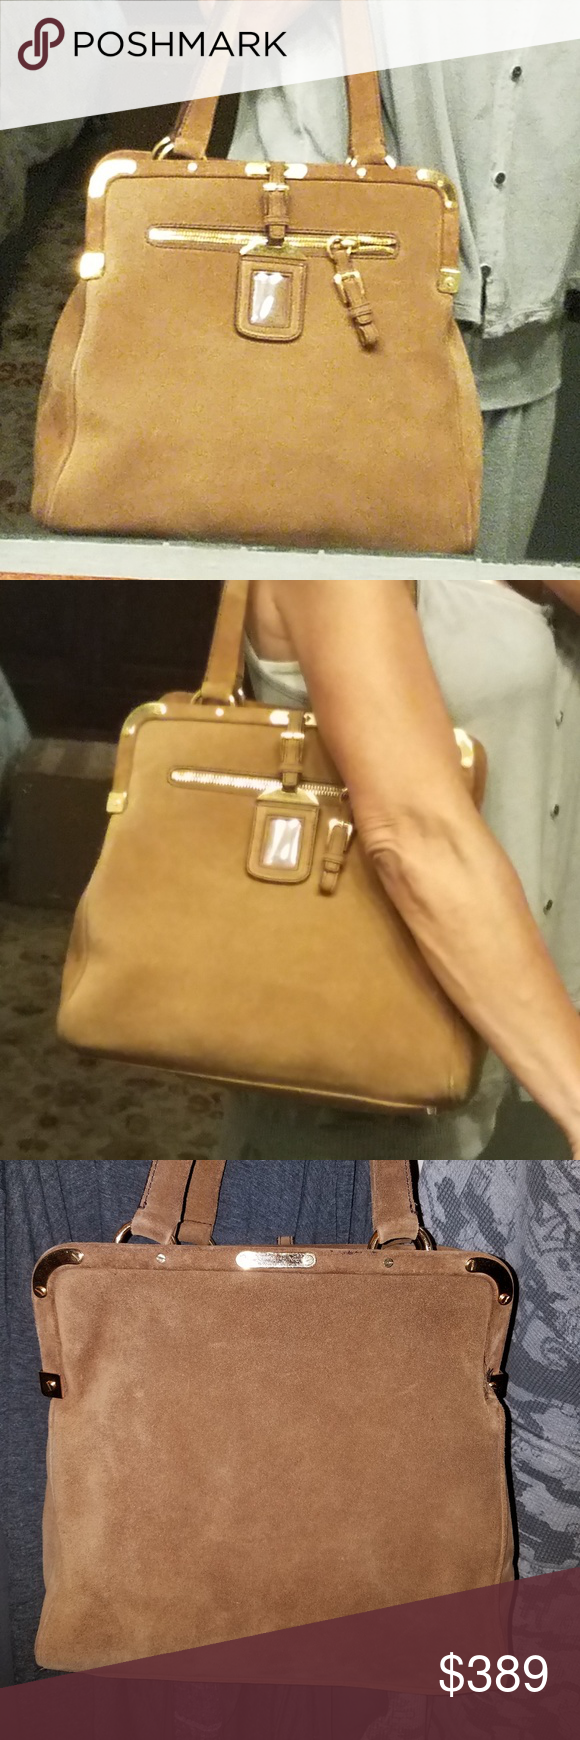 I just added this listing on Poshmark  Authentic Prada suede Brown shoulder  bag.  shopmycloset  poshmark  fashion  shopping  style  forsale  Prada   Handbags 4e92eb50e9